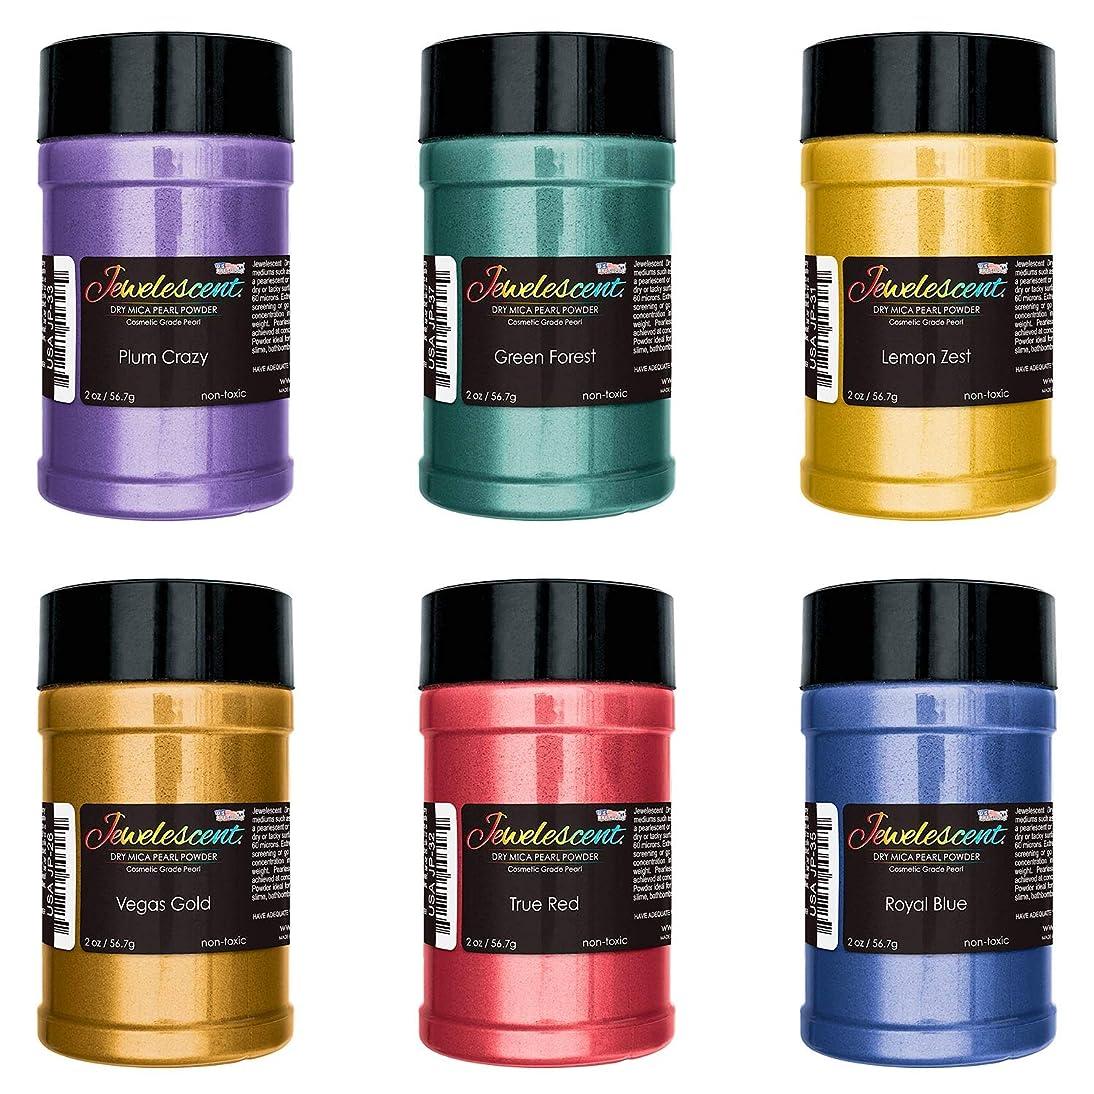 U.S. Art Supply Jewelescent Basic 6 Color Mica Pearl Powder Pigment Set Kit, 2 oz (57g) Shaker Bottles - Cosmetic Grade, Non-Toxic Metallic Color Dye - Paint, Epoxy, Resin, Soap, Slime Making, Art